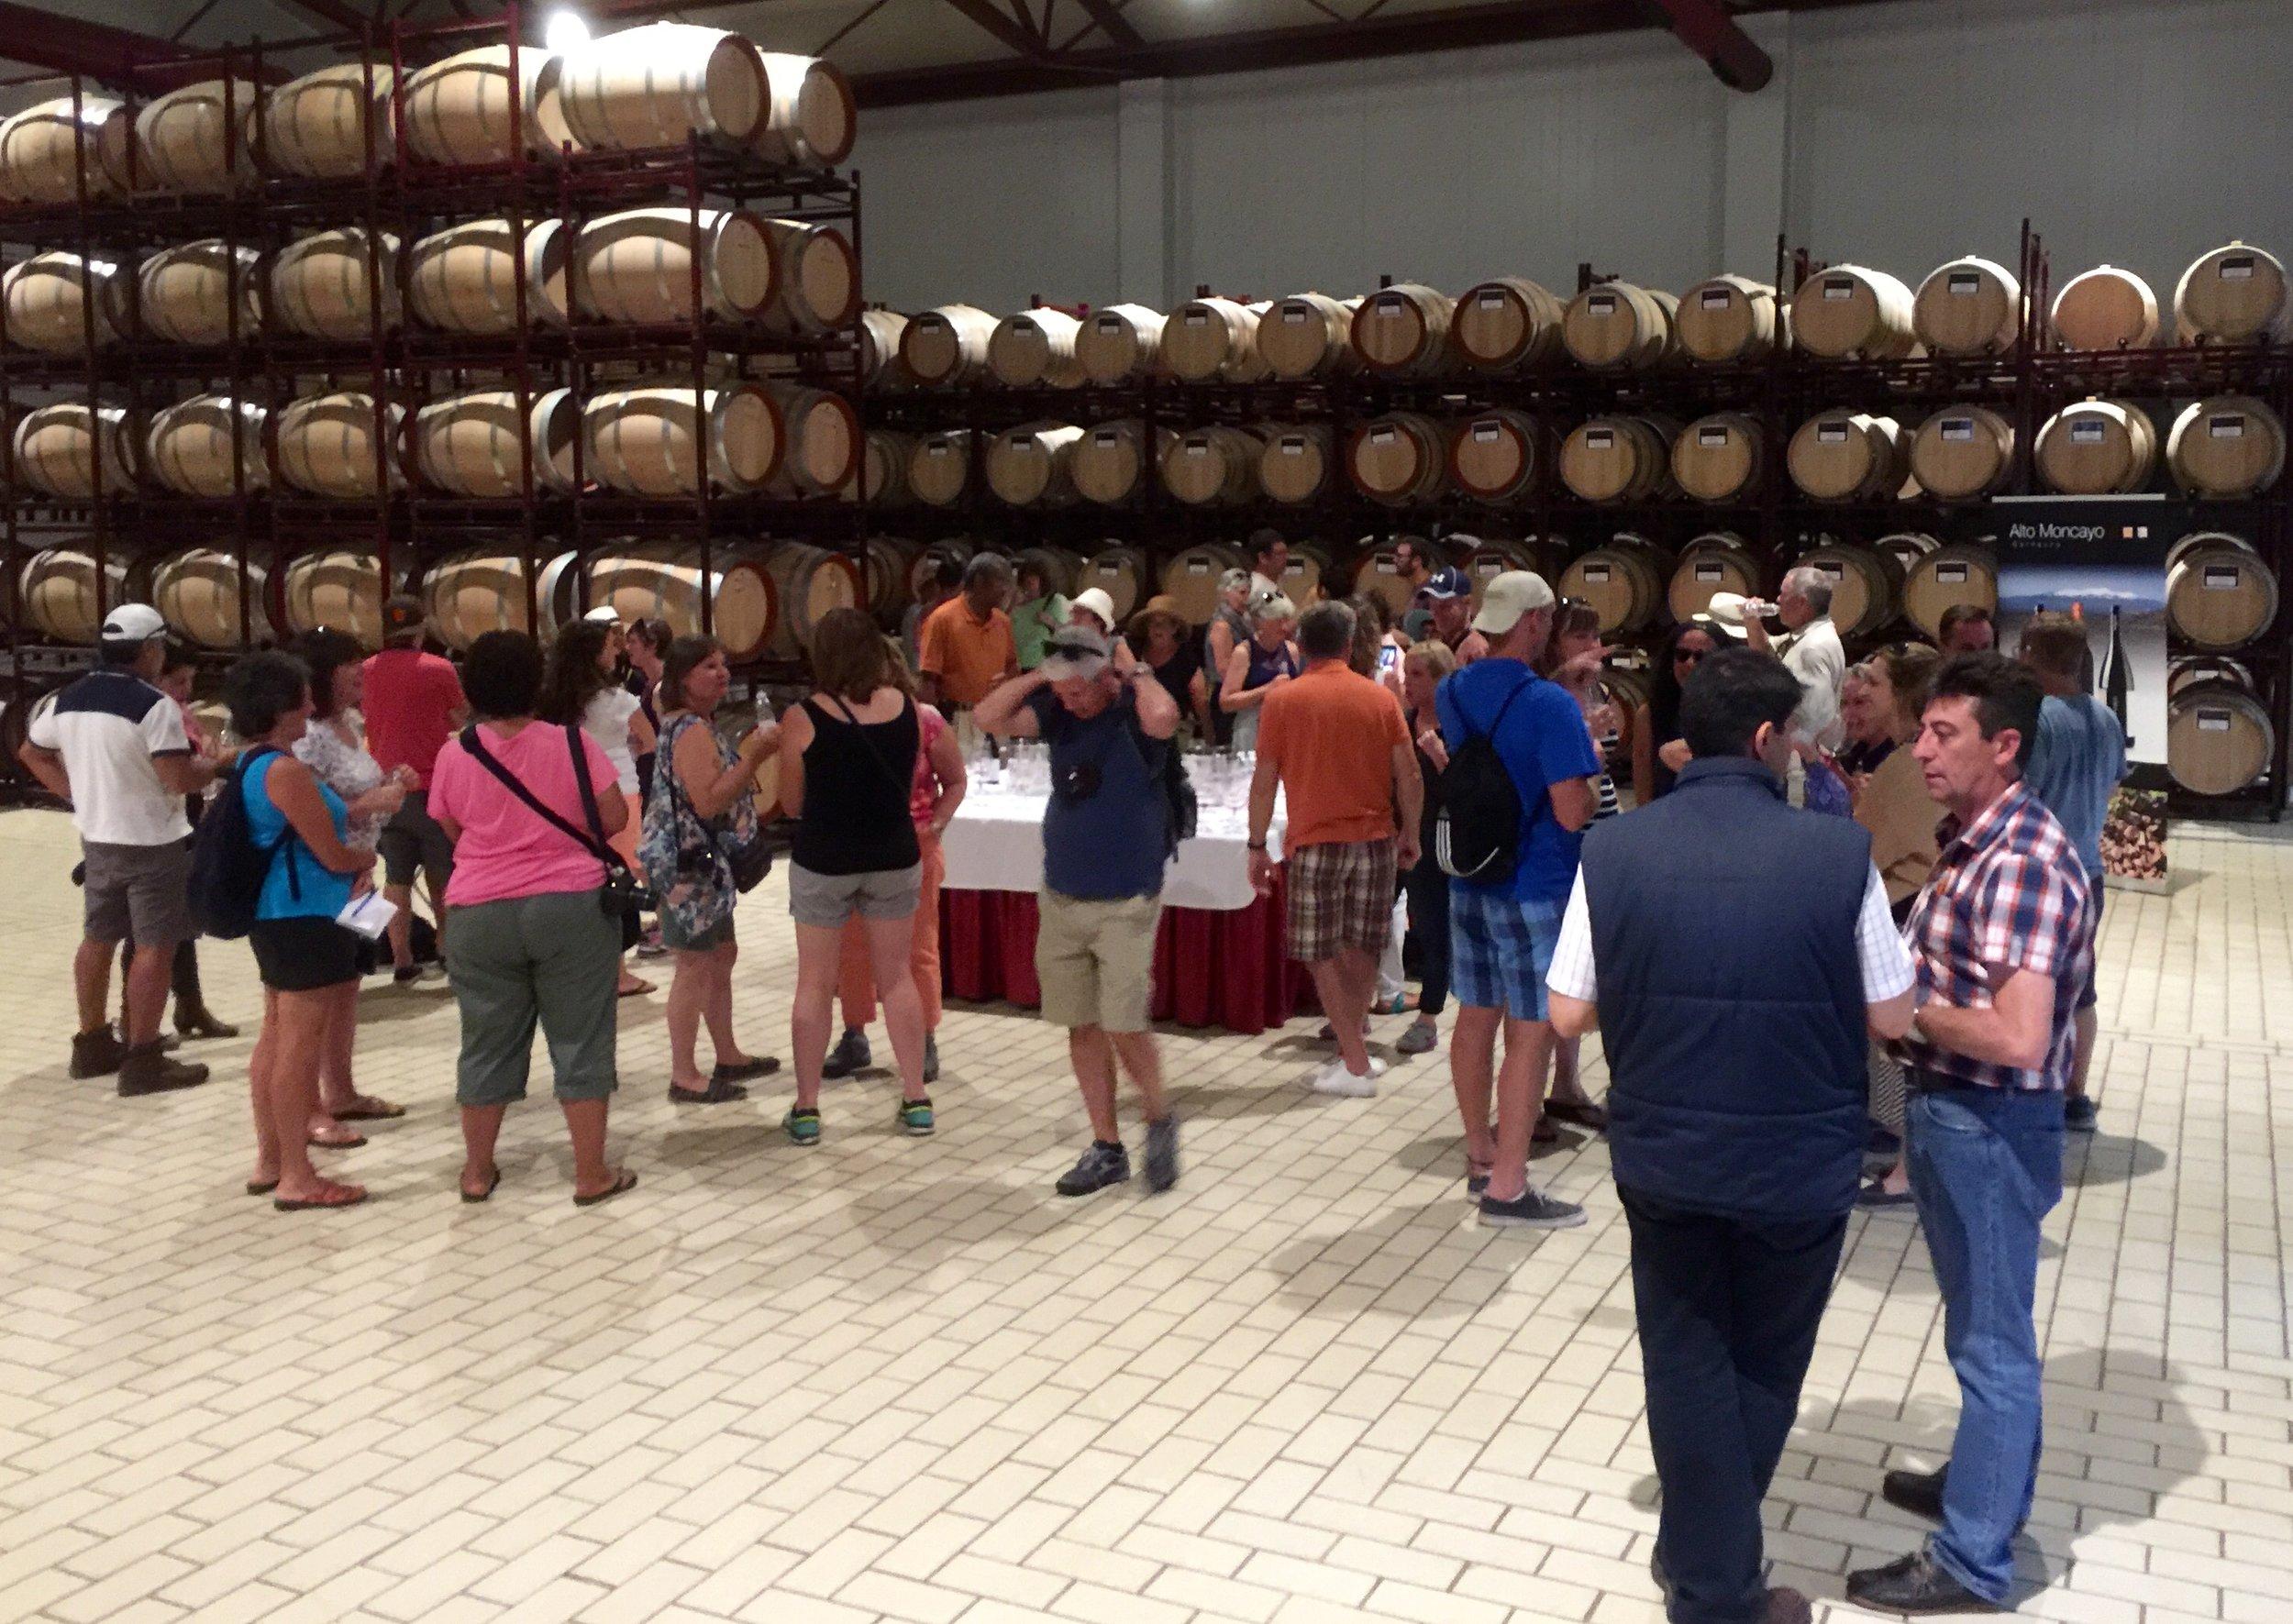 Barrel tasting at Alto Moncayo Winery in Campo Borja.